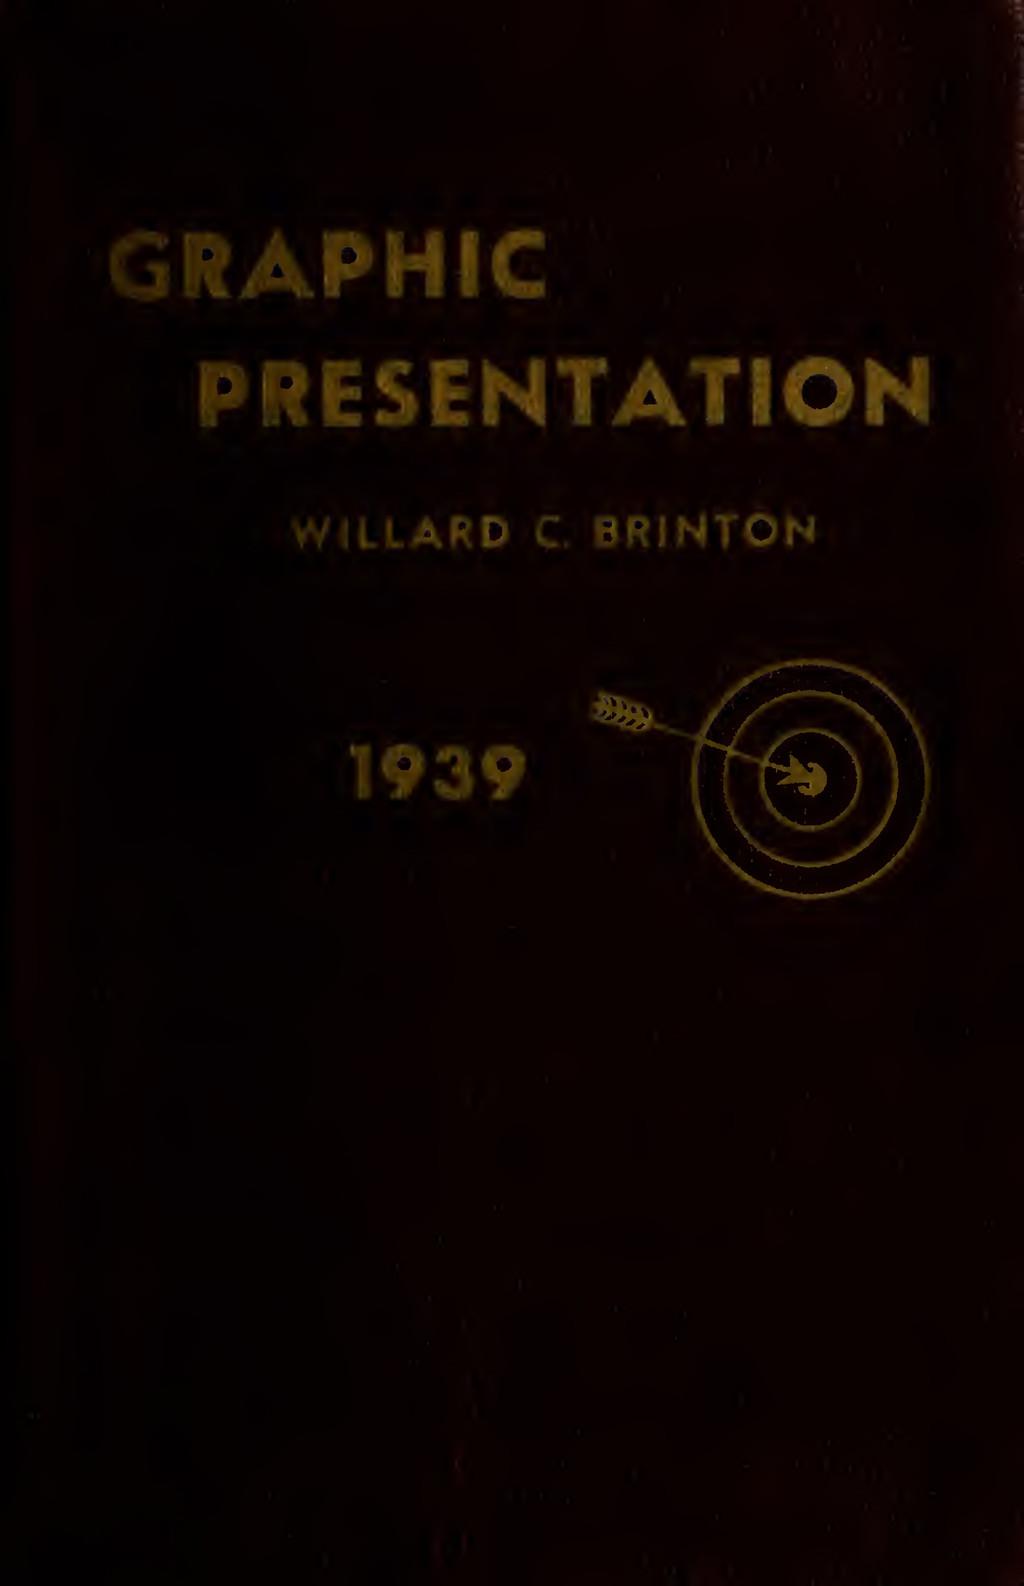 GRAPHIC PRESENTATION WILLARD C. 8RINTON 1939 %^